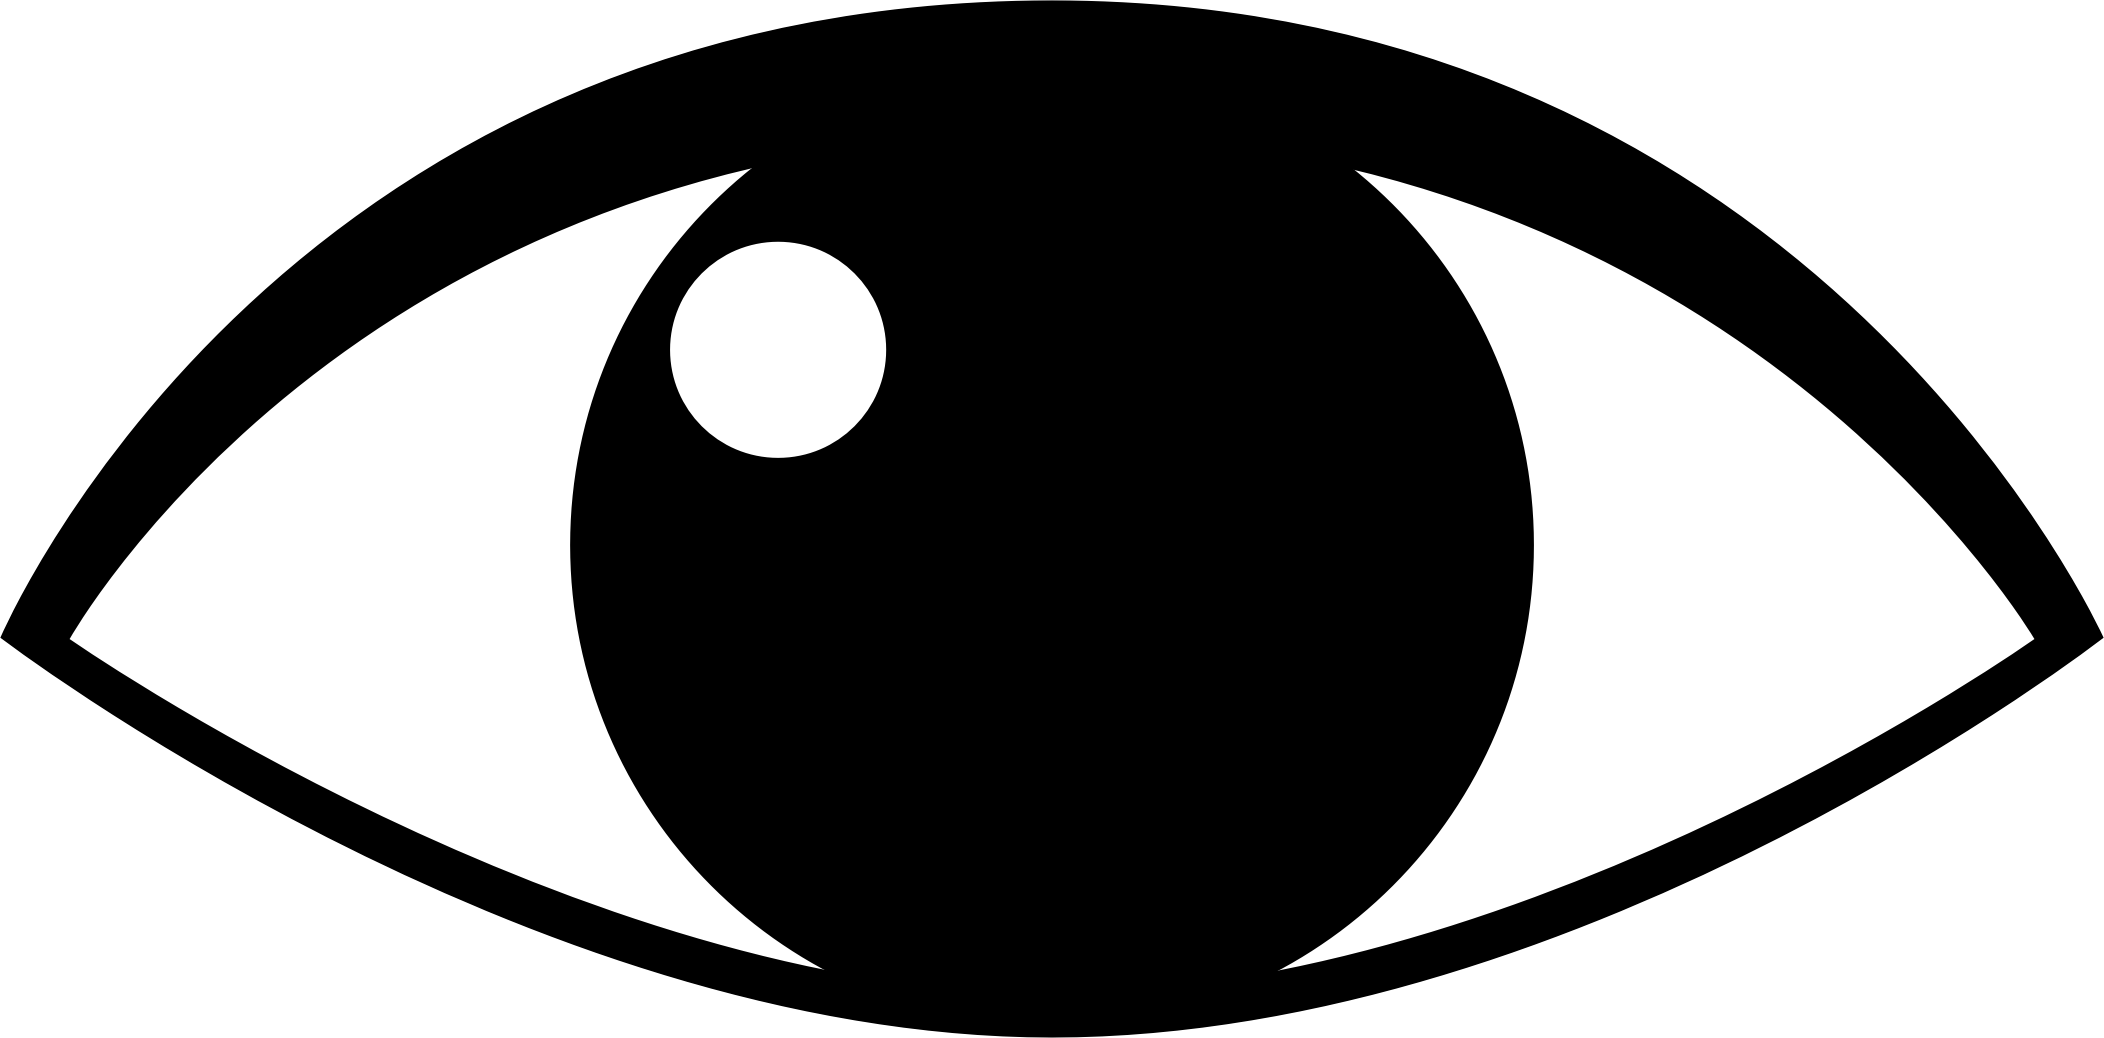 Eyeball clipart 2